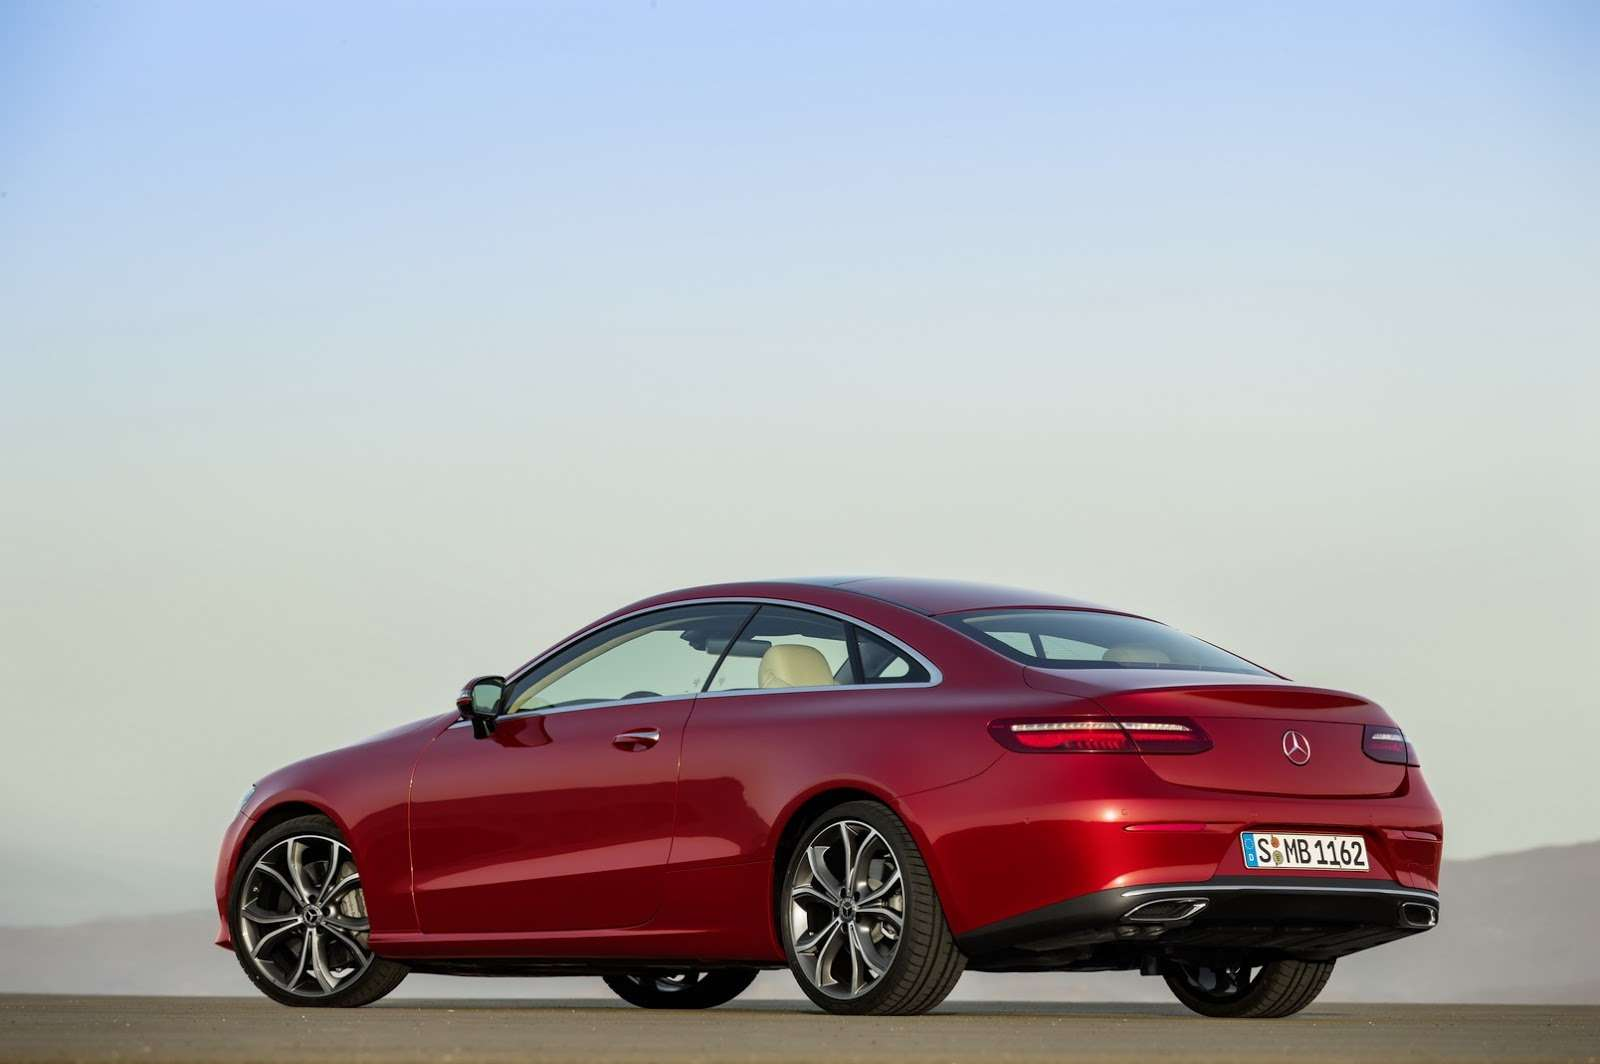 Больше илучше: Mercedes-Benz представил новое купе E-класса— фото 678184